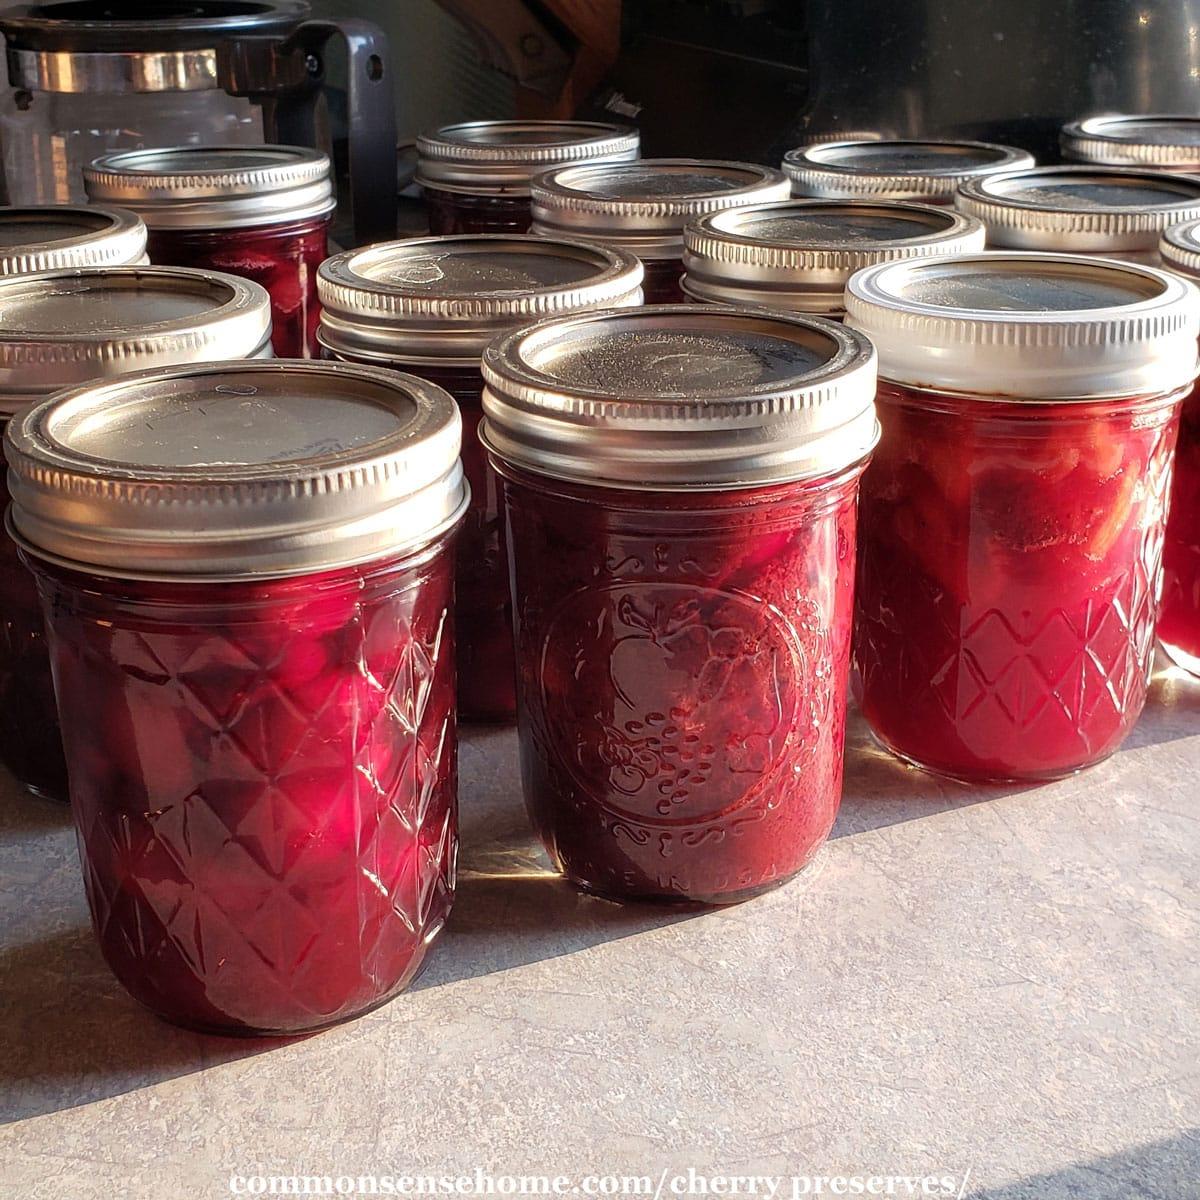 jars of homemade preserves